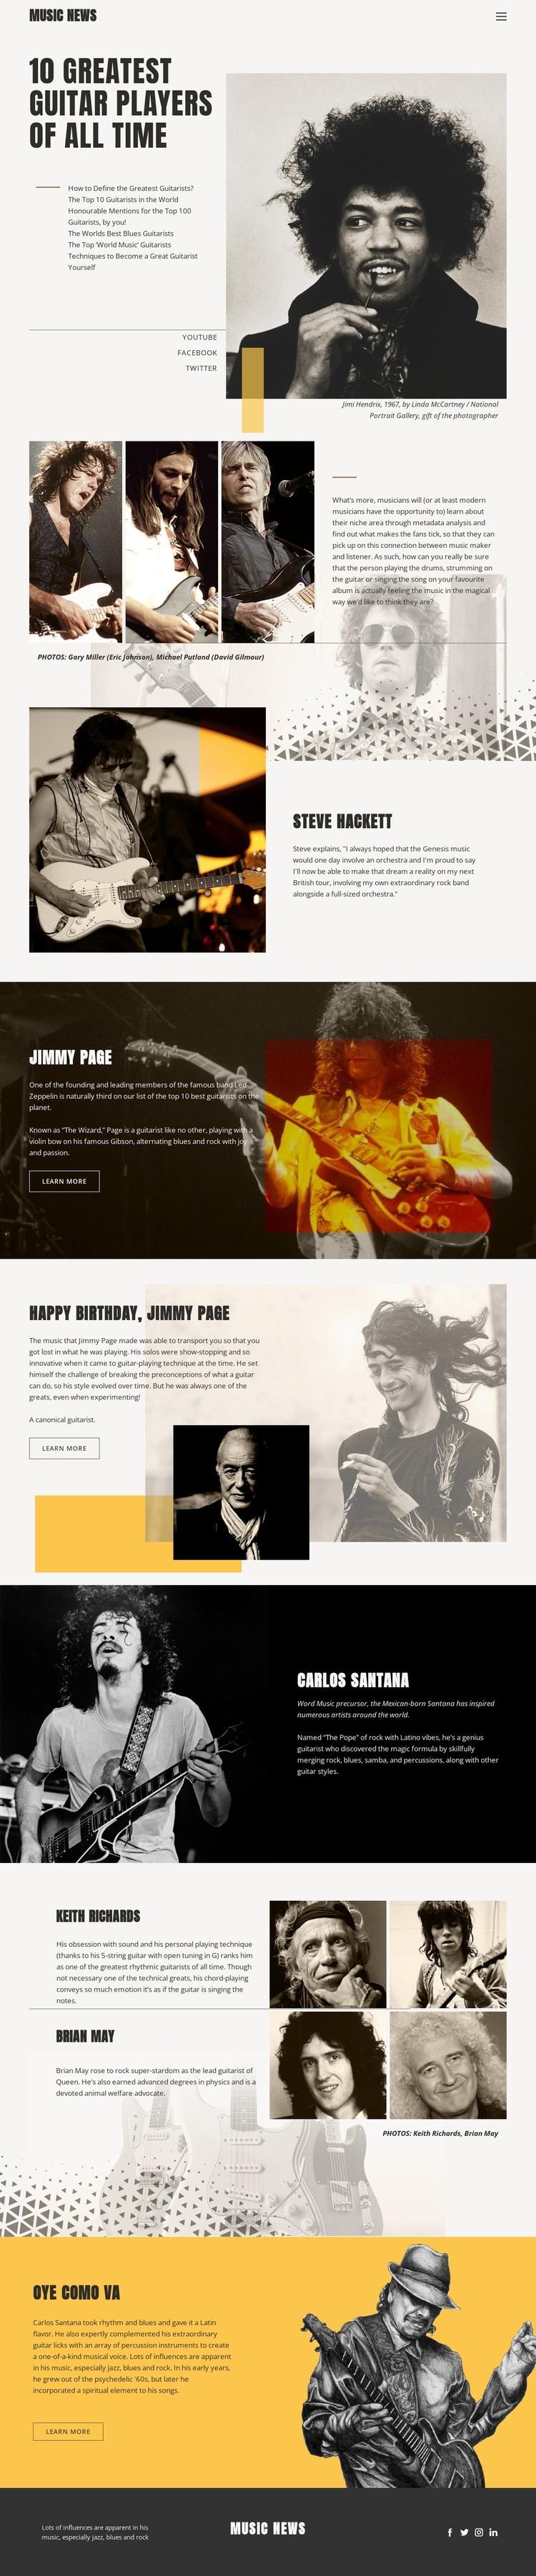 The Top Guitar Players WordPress Template